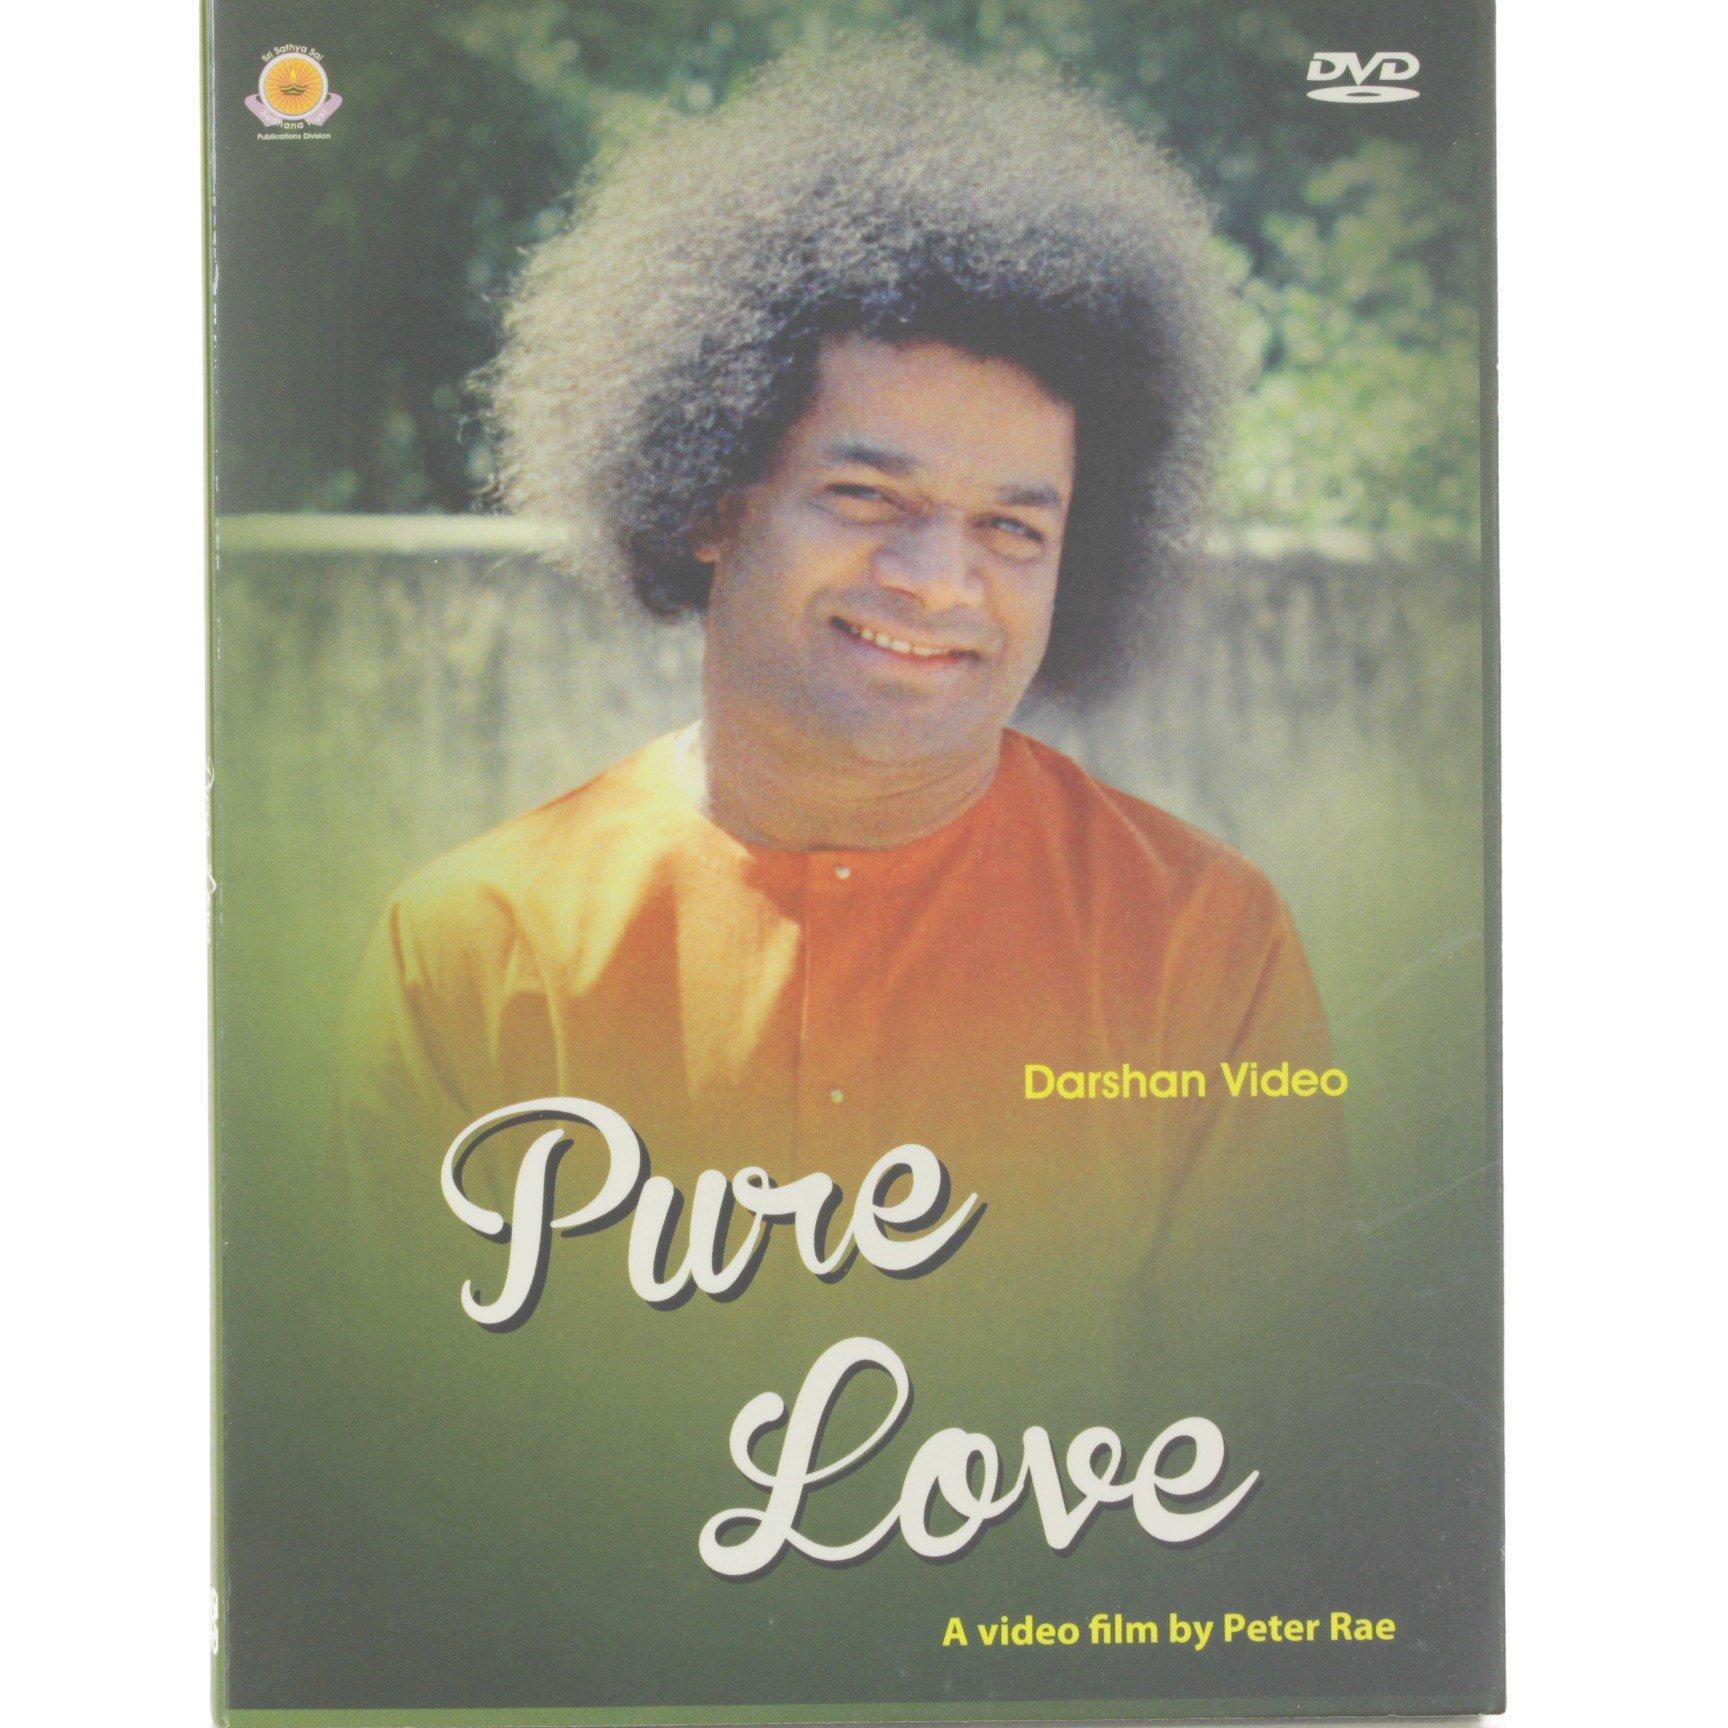 Pure Love(サイババのダルシャンDVD)